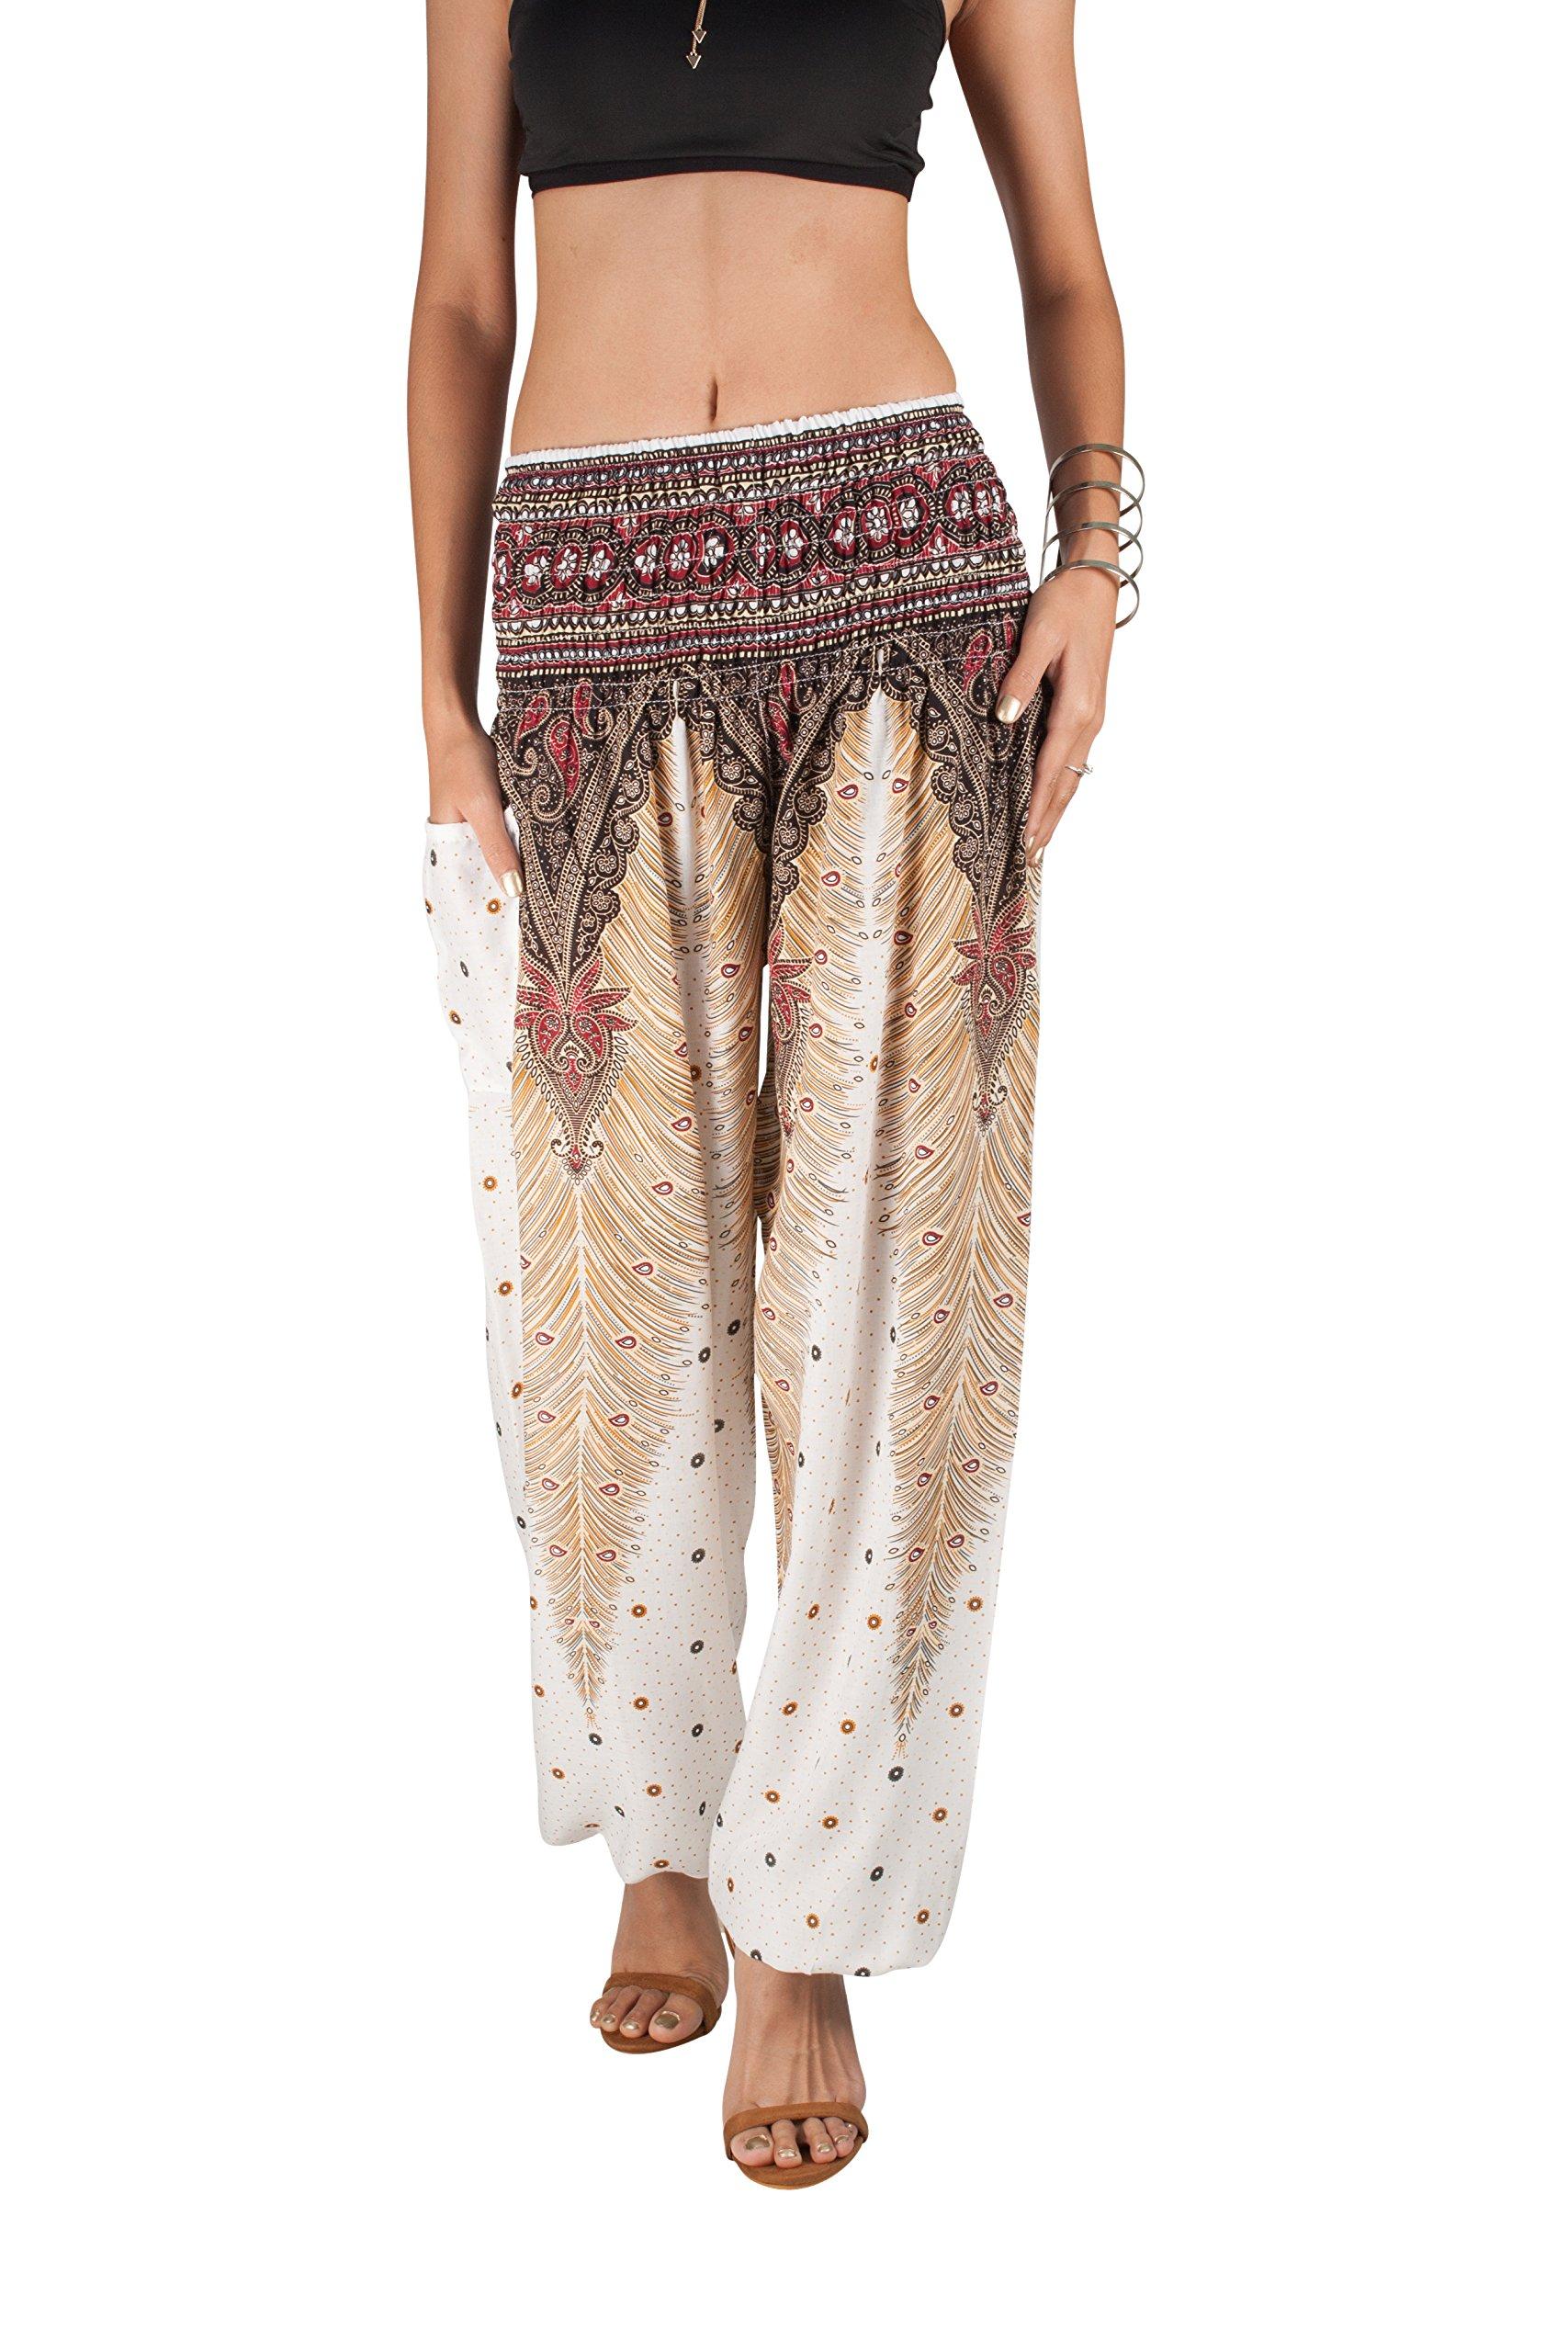 JOOP JOOP Bohemian Tapered Elephant Harem Loose Yoga Pants, White, S/M